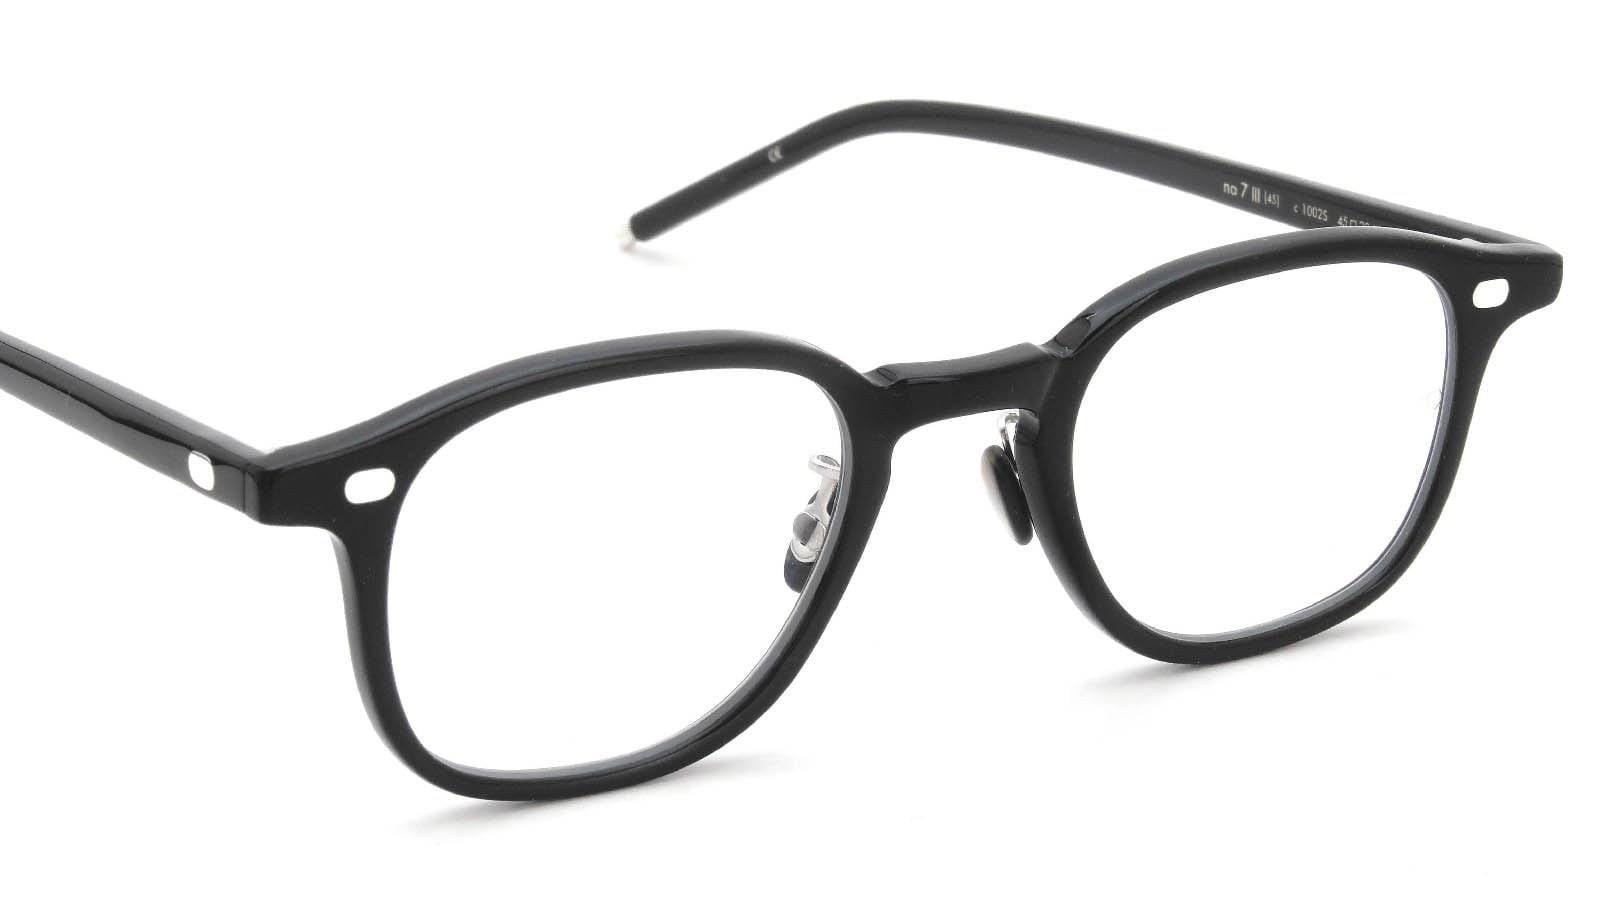 10 eyevan NO.7 Ⅲ 45size 6